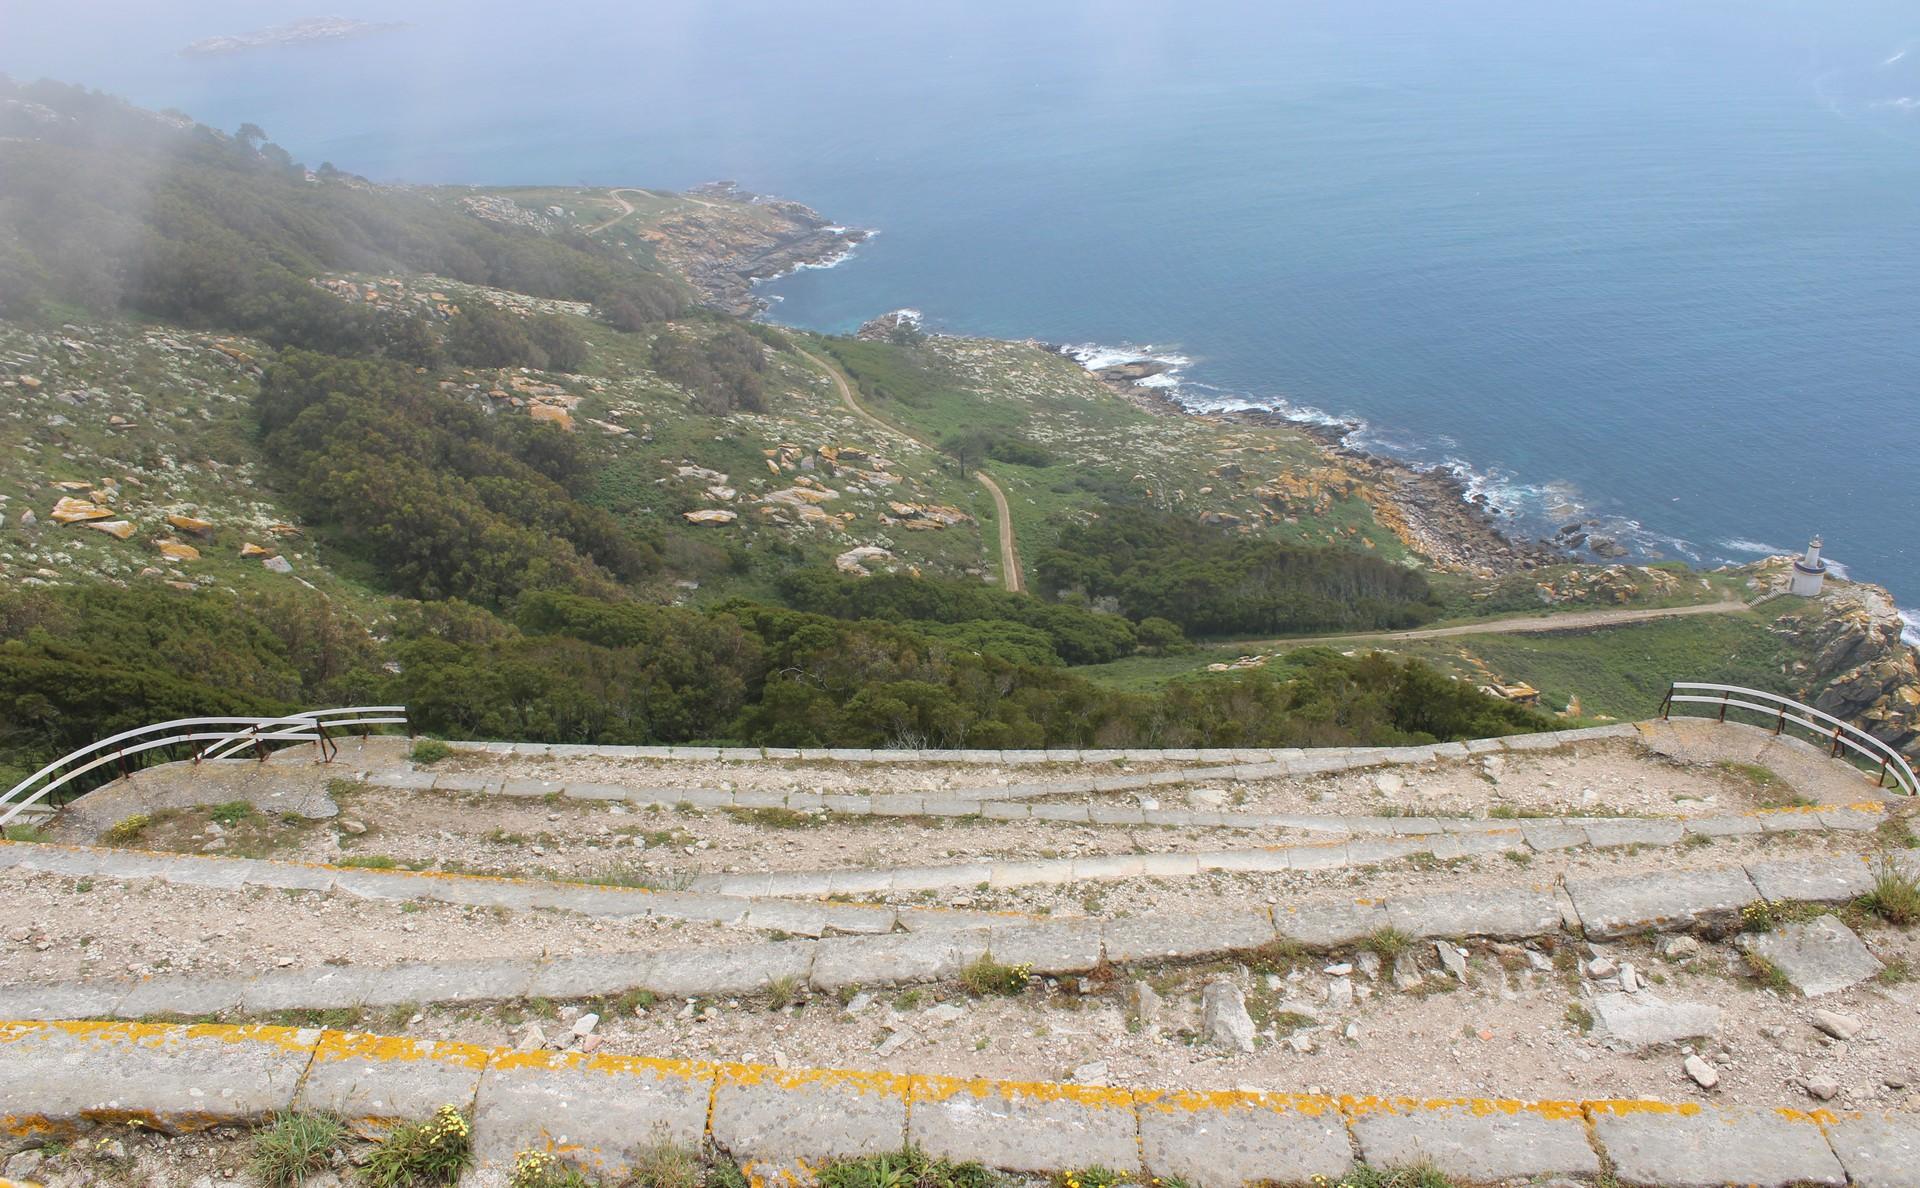 islas-ci-ruta-monte-faro-1ee8295dff2cd79